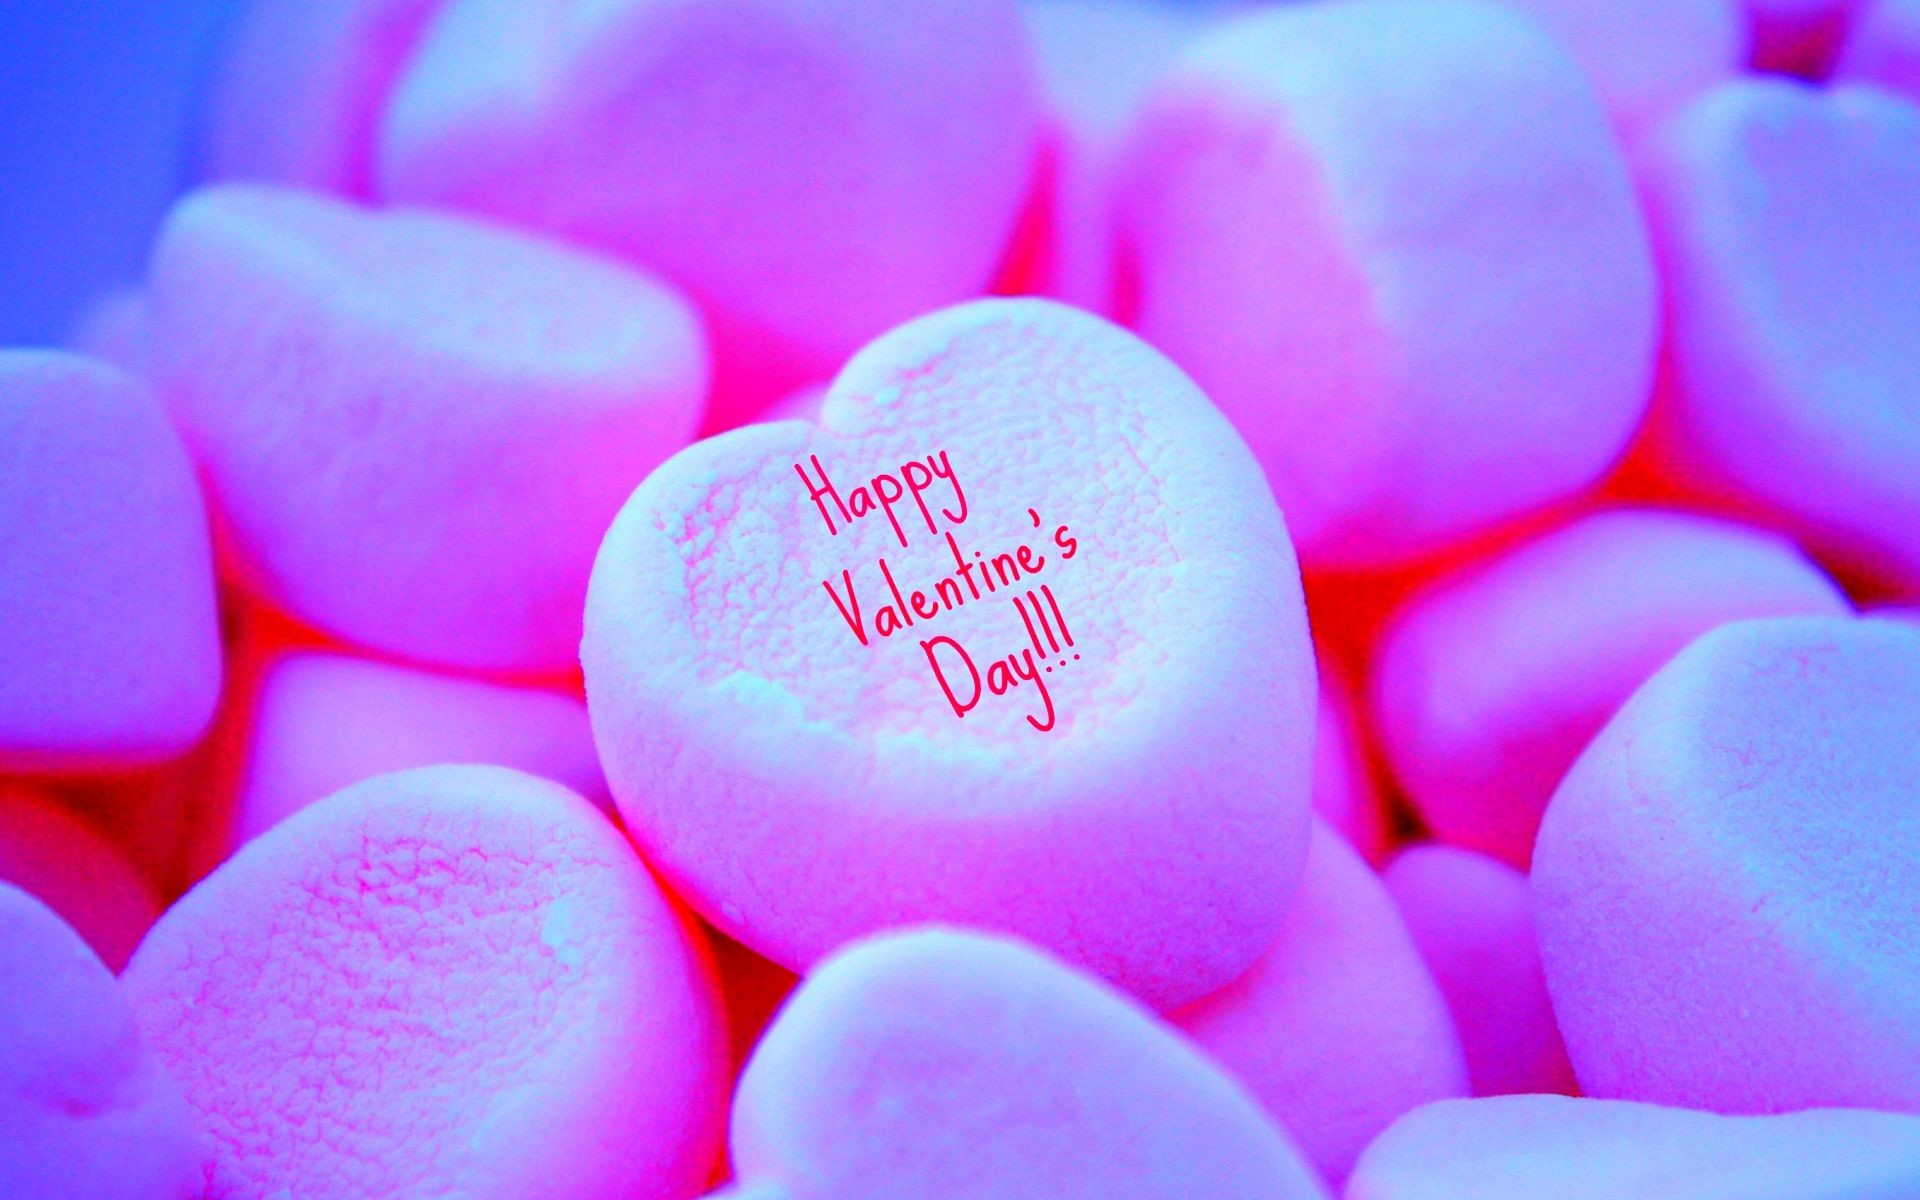 Valentines day desktop wallpaper 65 images - Background for valentine pictures ...